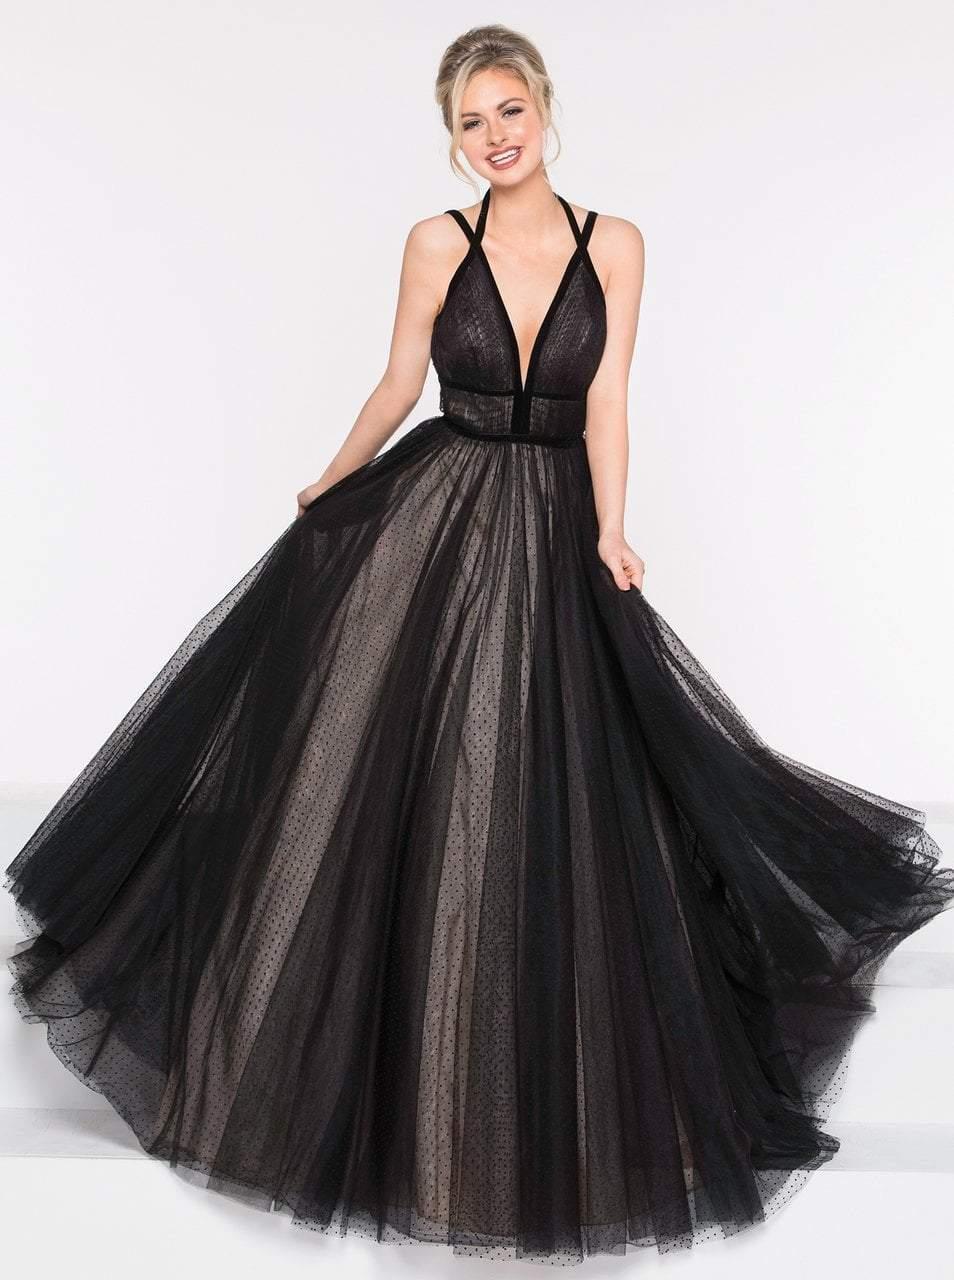 Colors Dress - 2009 Sleeveless Deep V-neck Dotted Ballgown